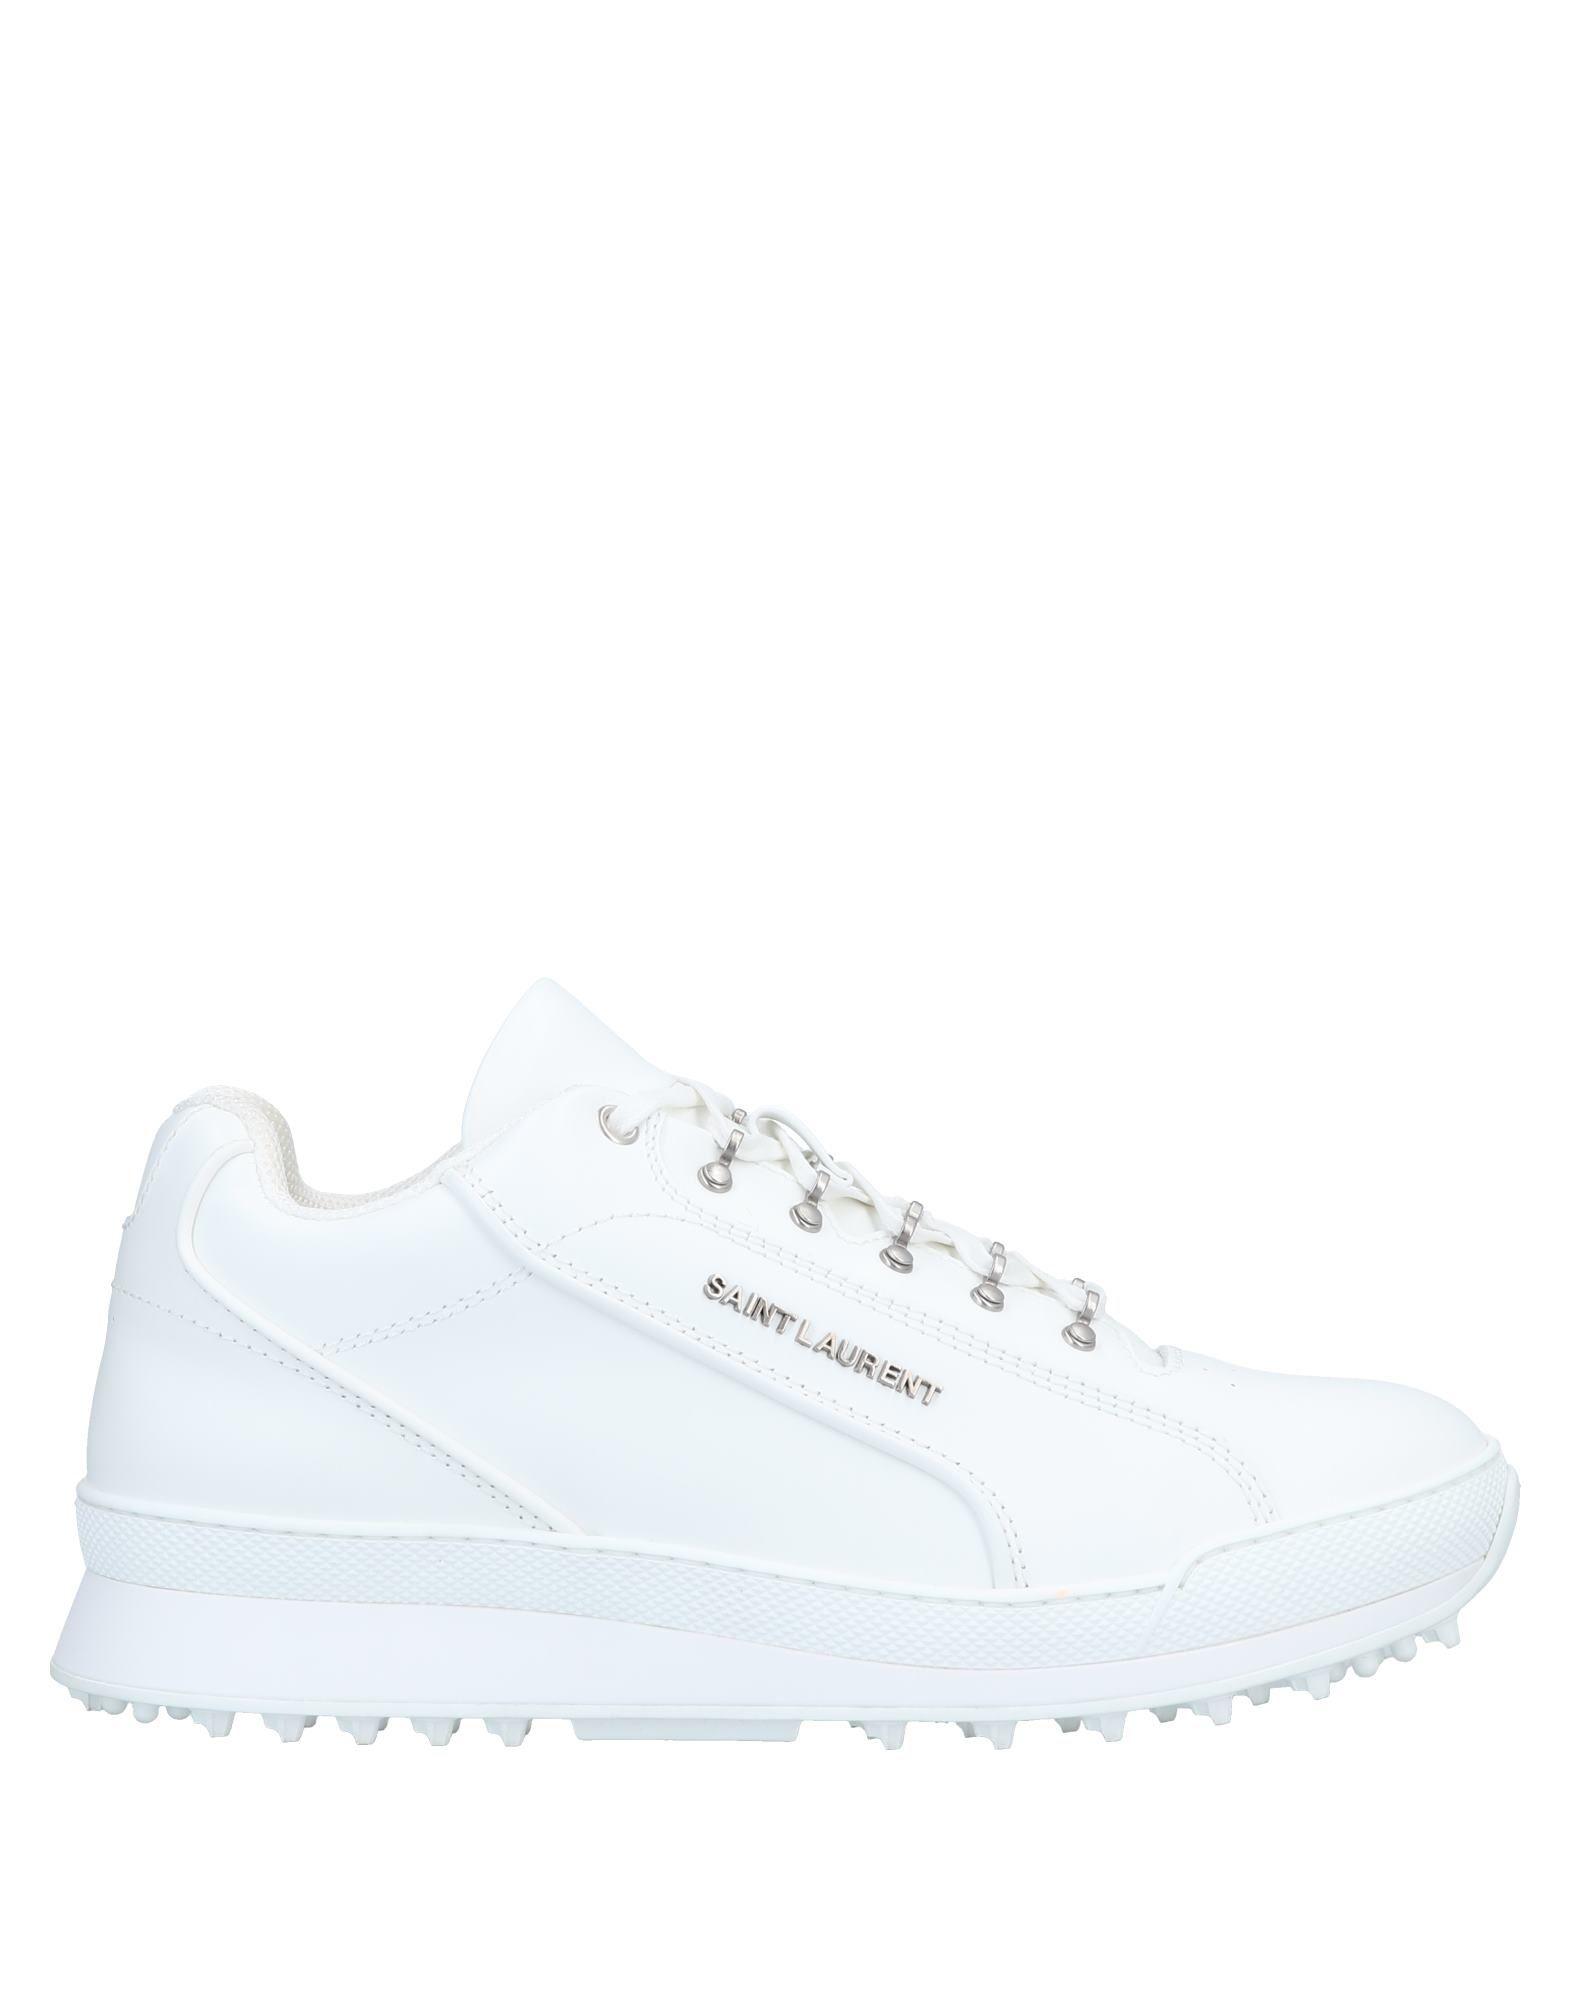 Saint Laurent Sneakers - Men Saint  Laurent Sneakers online on  Saint Australia - 11575485PI 869771